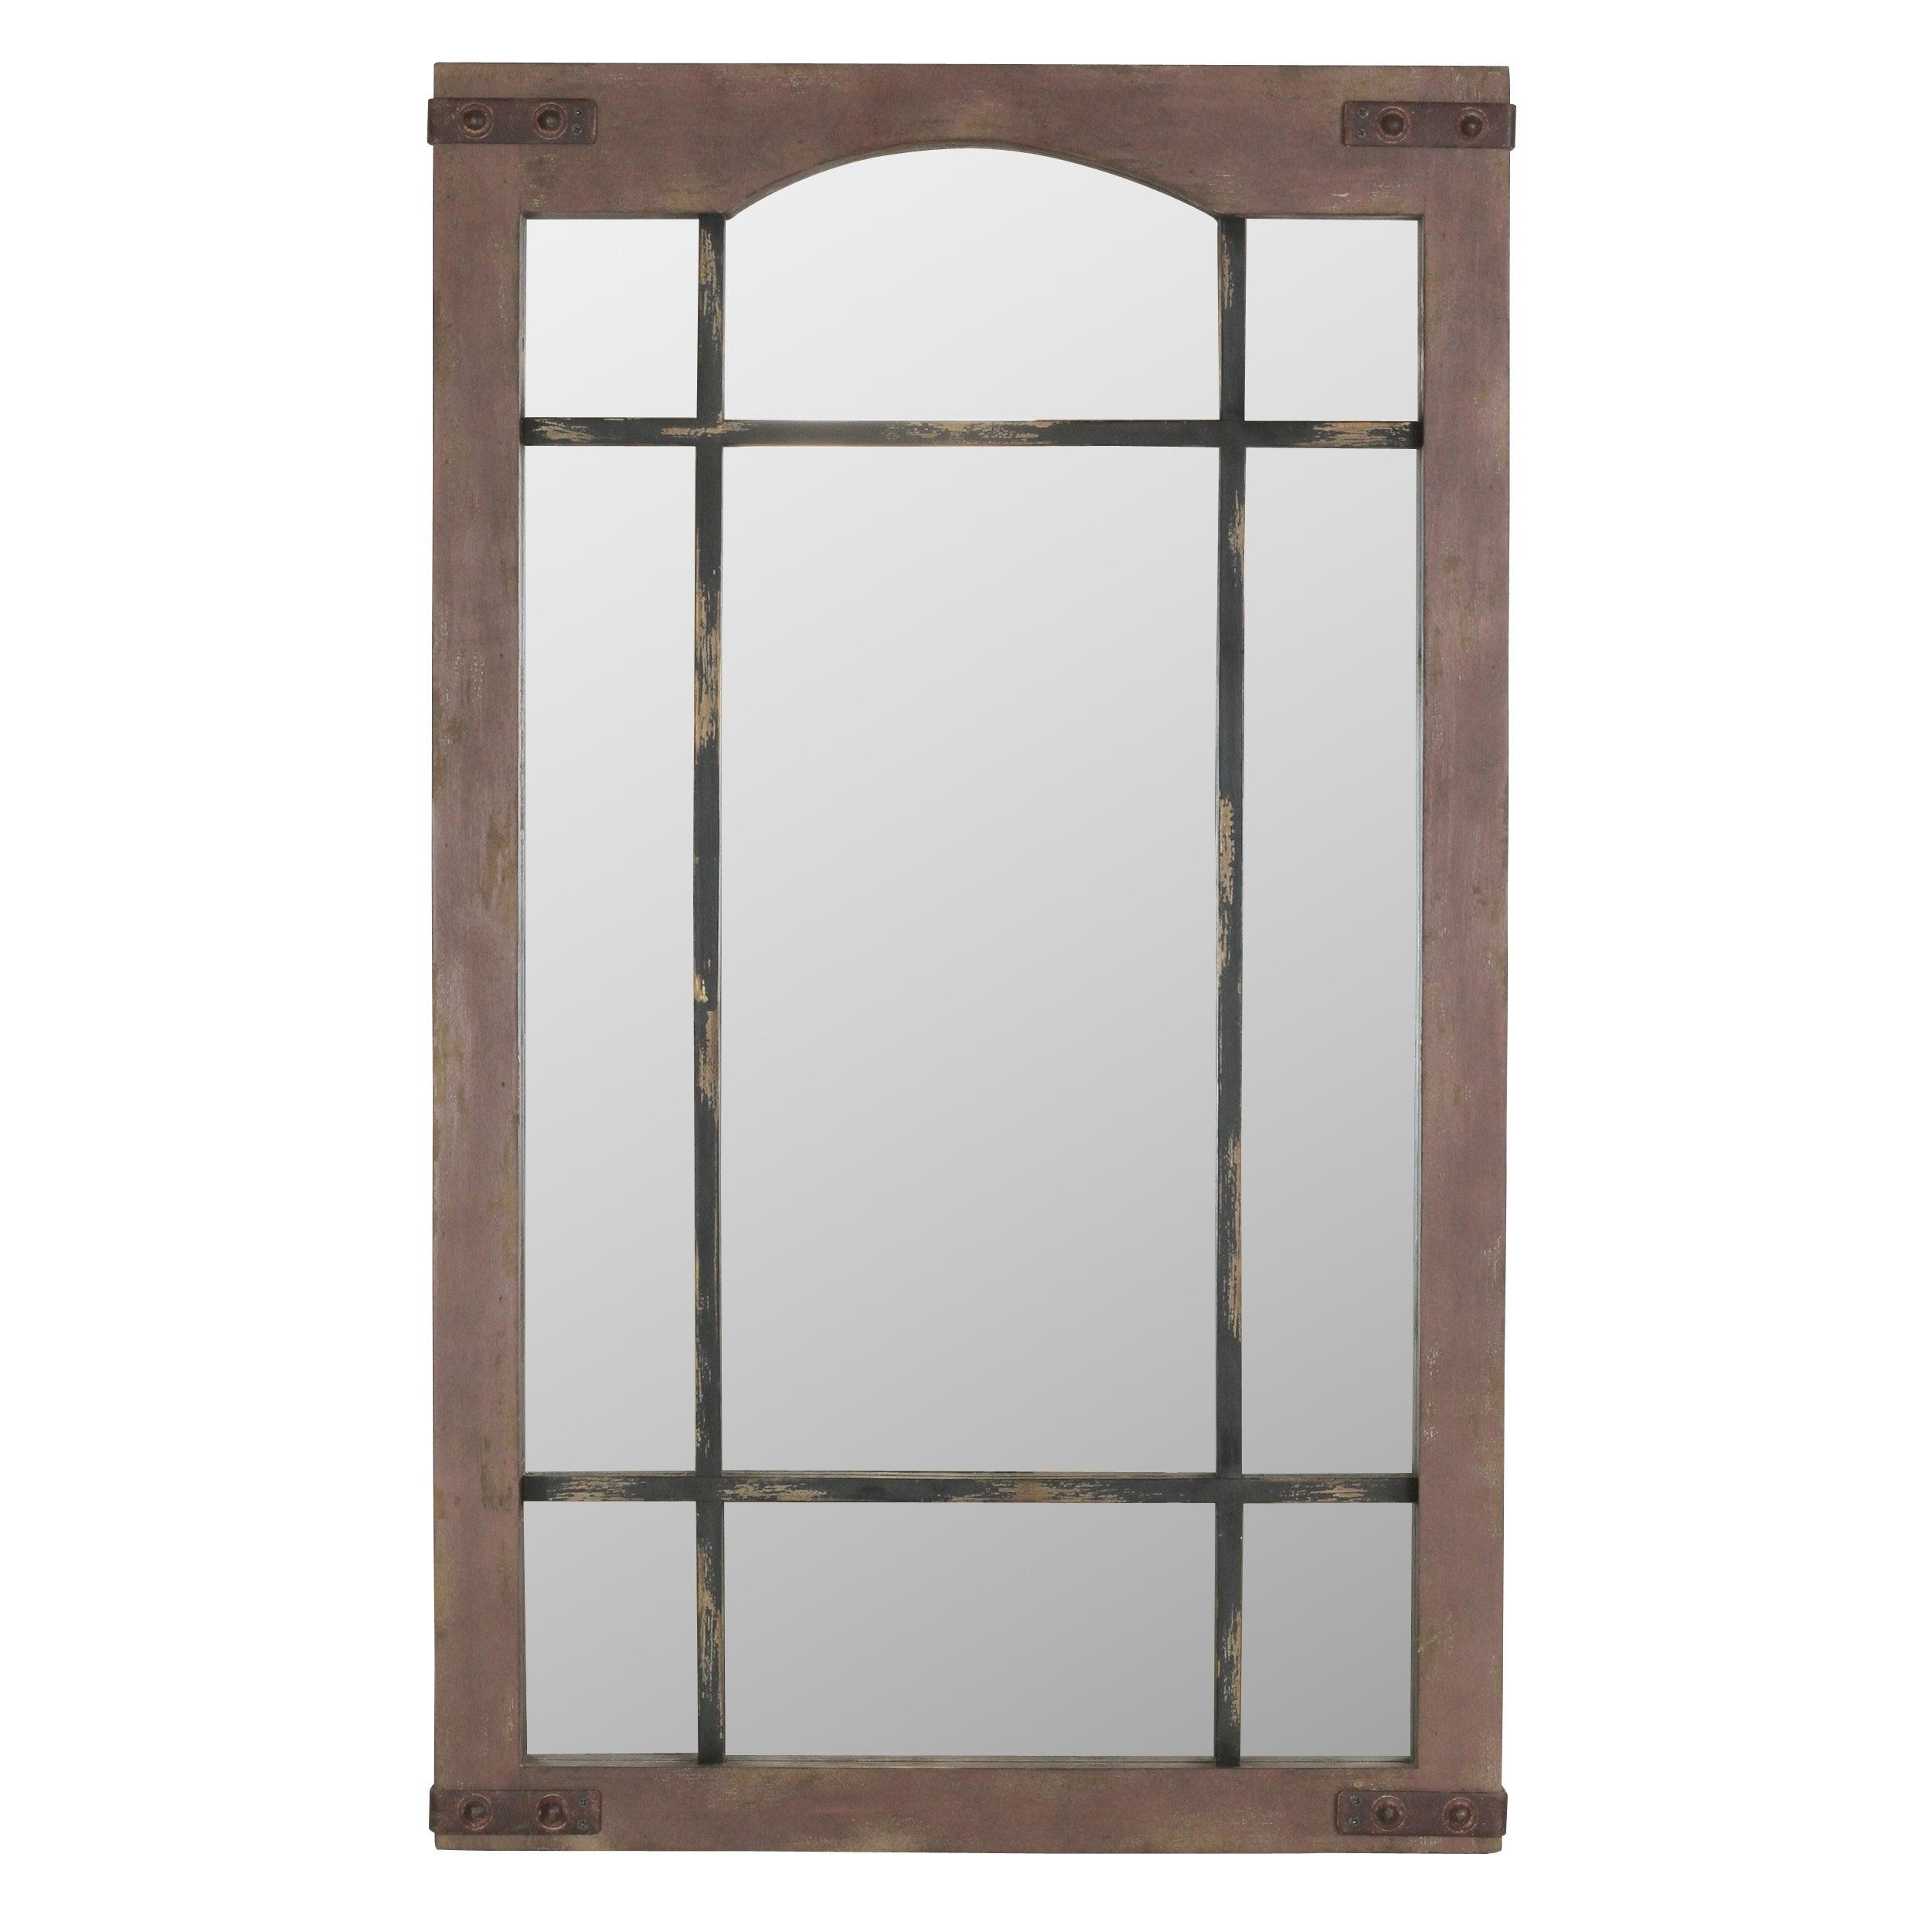 Sheridan Faux Window Wall Mirror – Brown With Regard To Faux Window Wood Wall Mirrors (View 4 of 20)